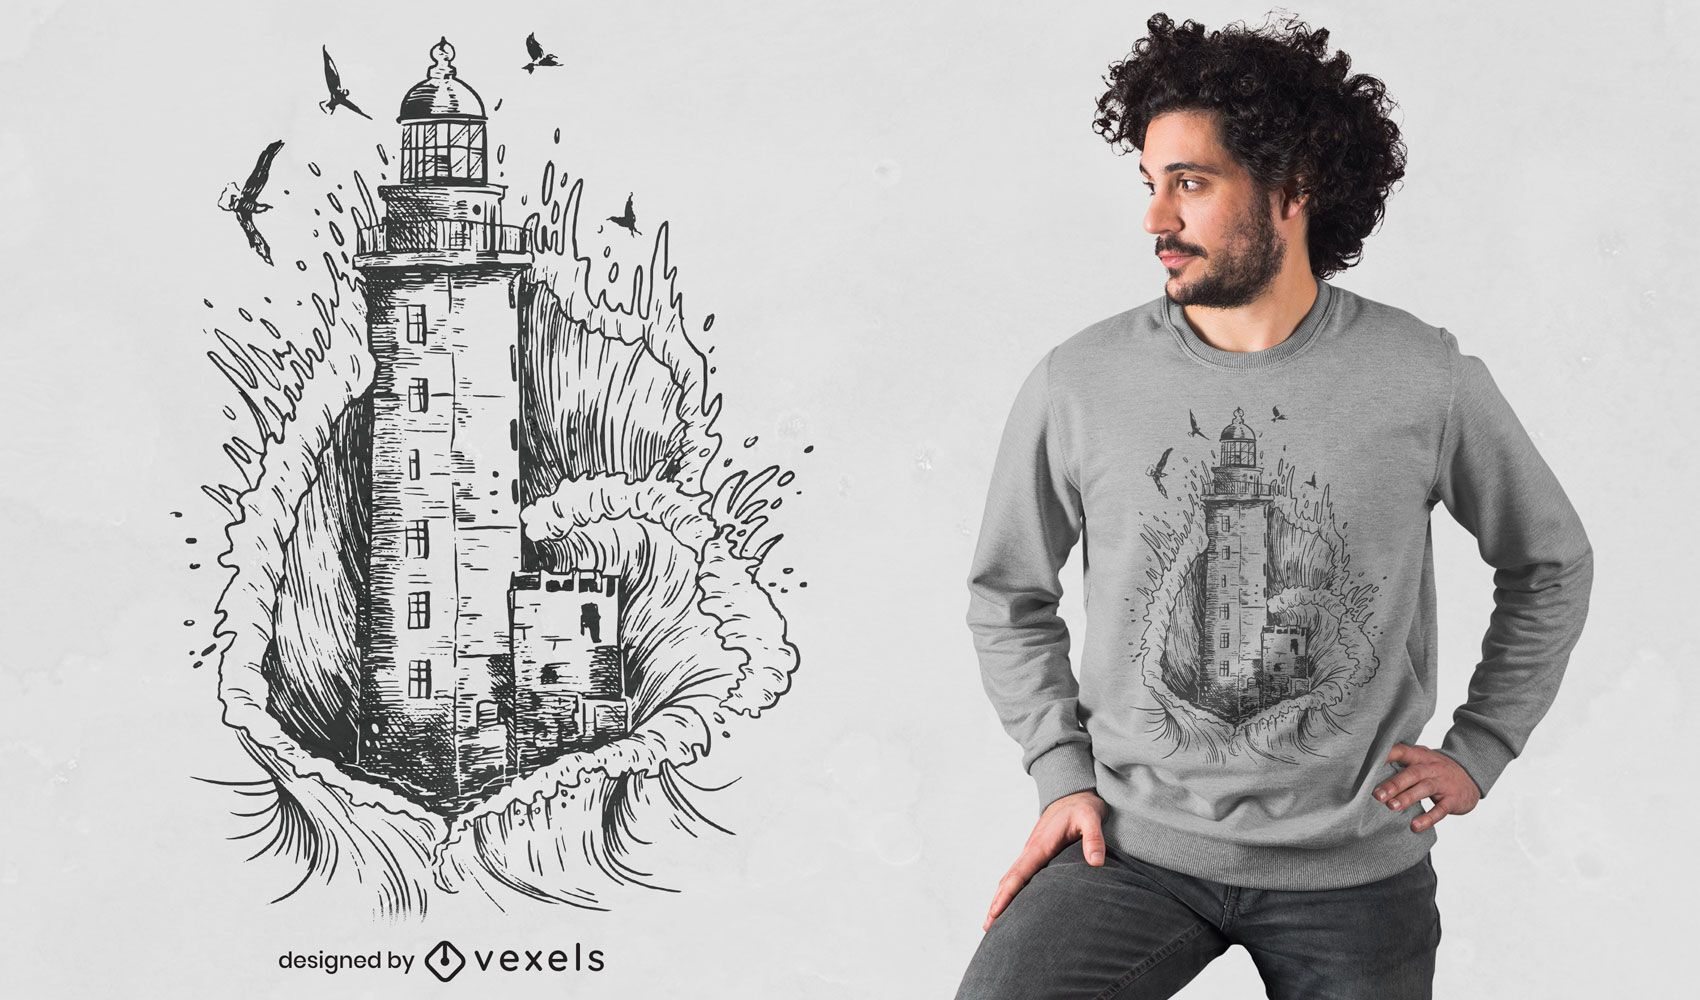 Diseño de camiseta de faro dibujado a mano.